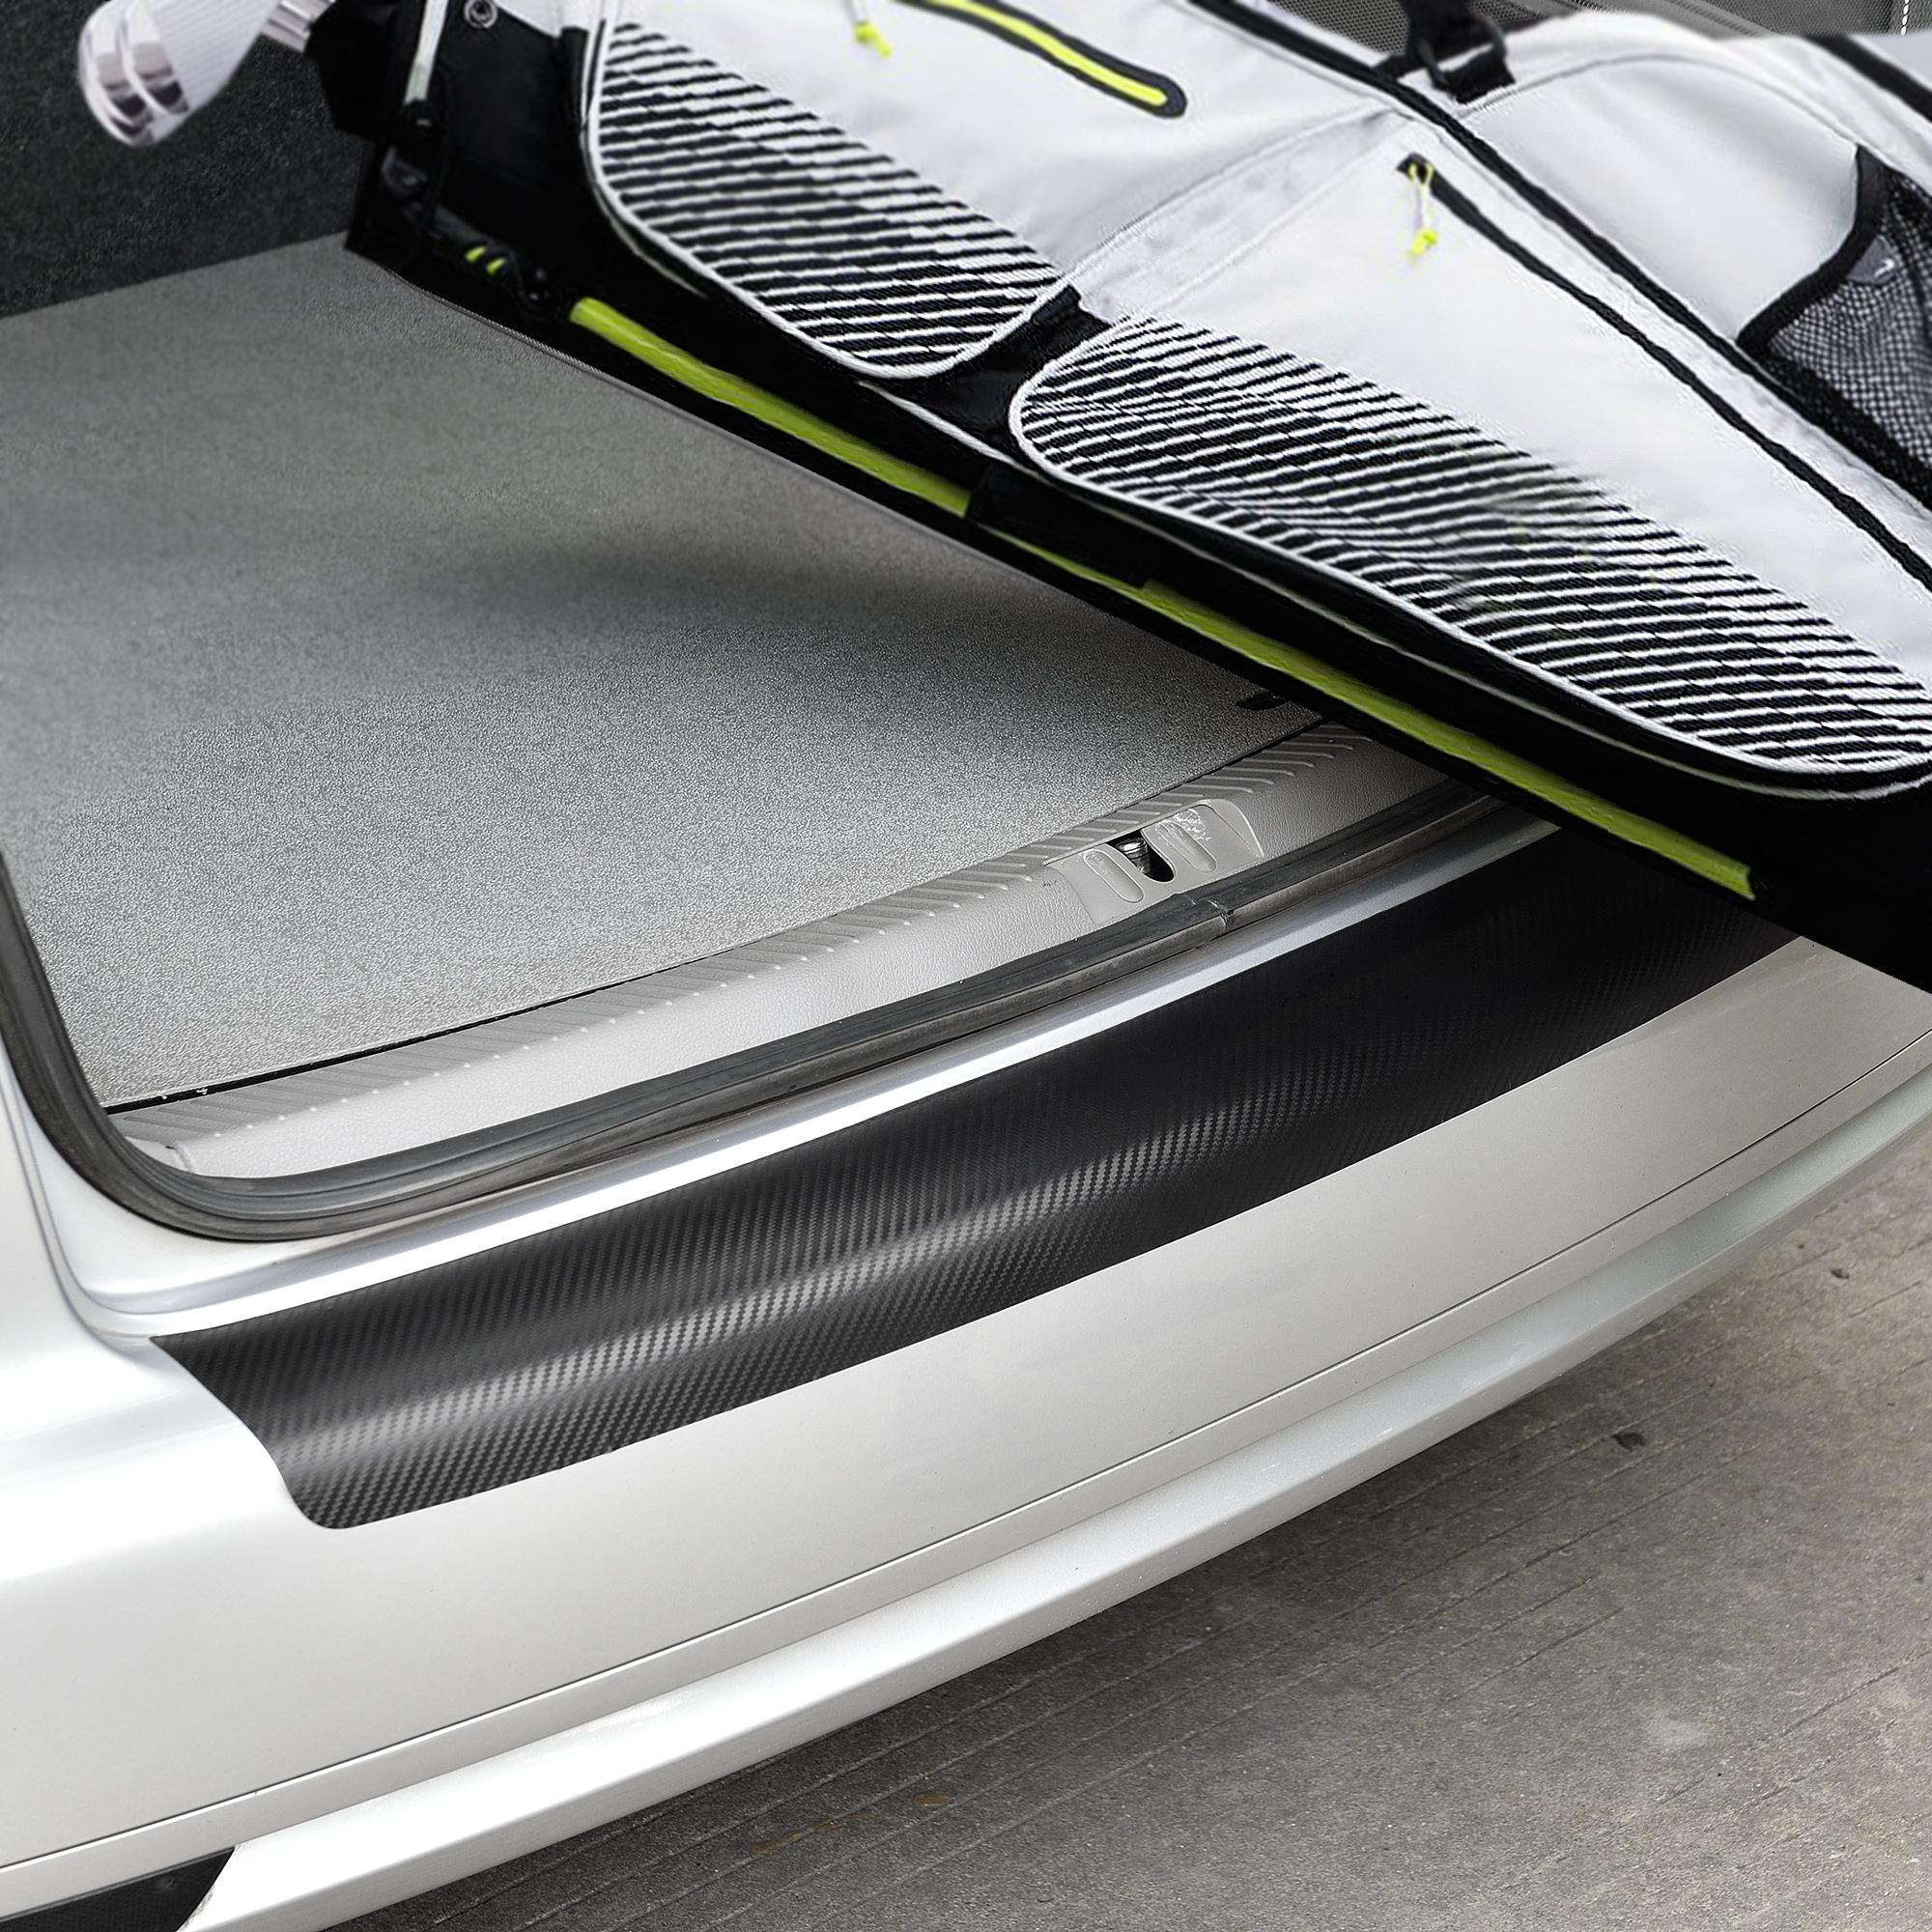 Ladekantenschutz-Folie Carbon Ford GRAND C-MAX Lack//Ladekanten-Schutz